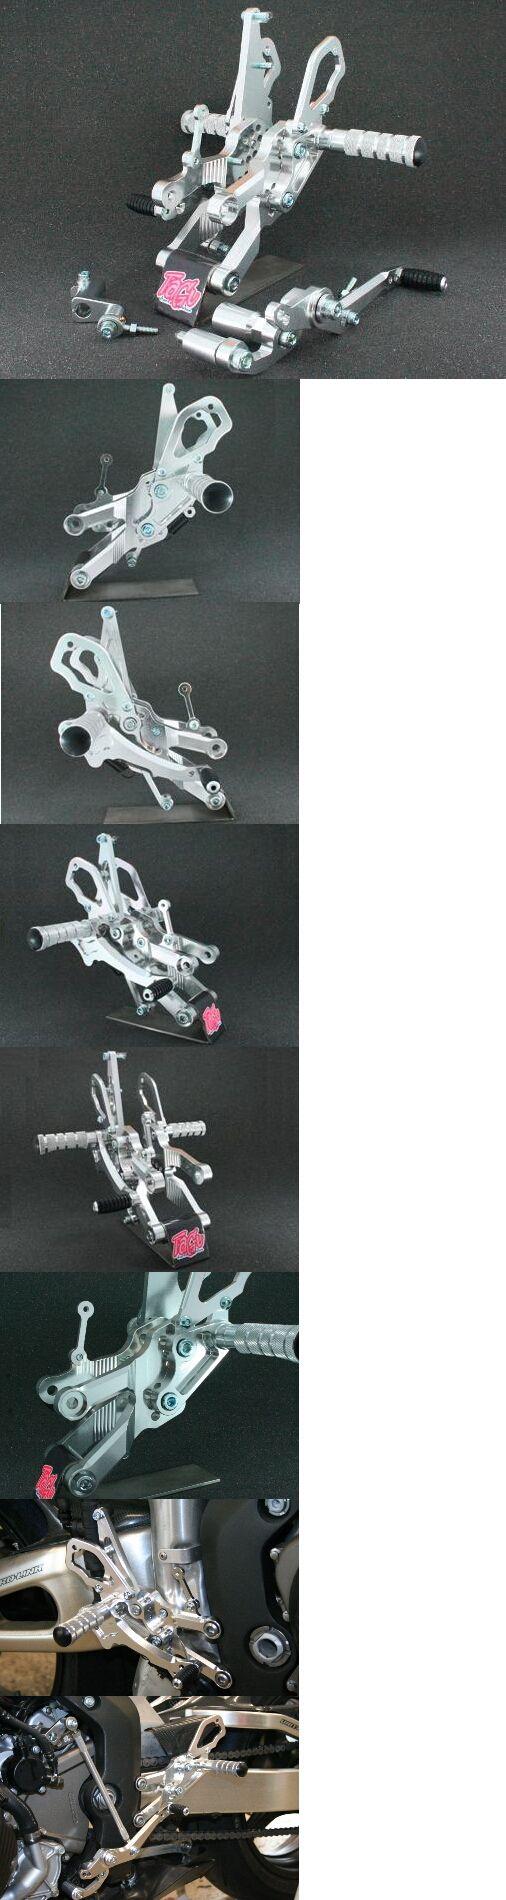 SC57 9段調整型腳踏後移套件